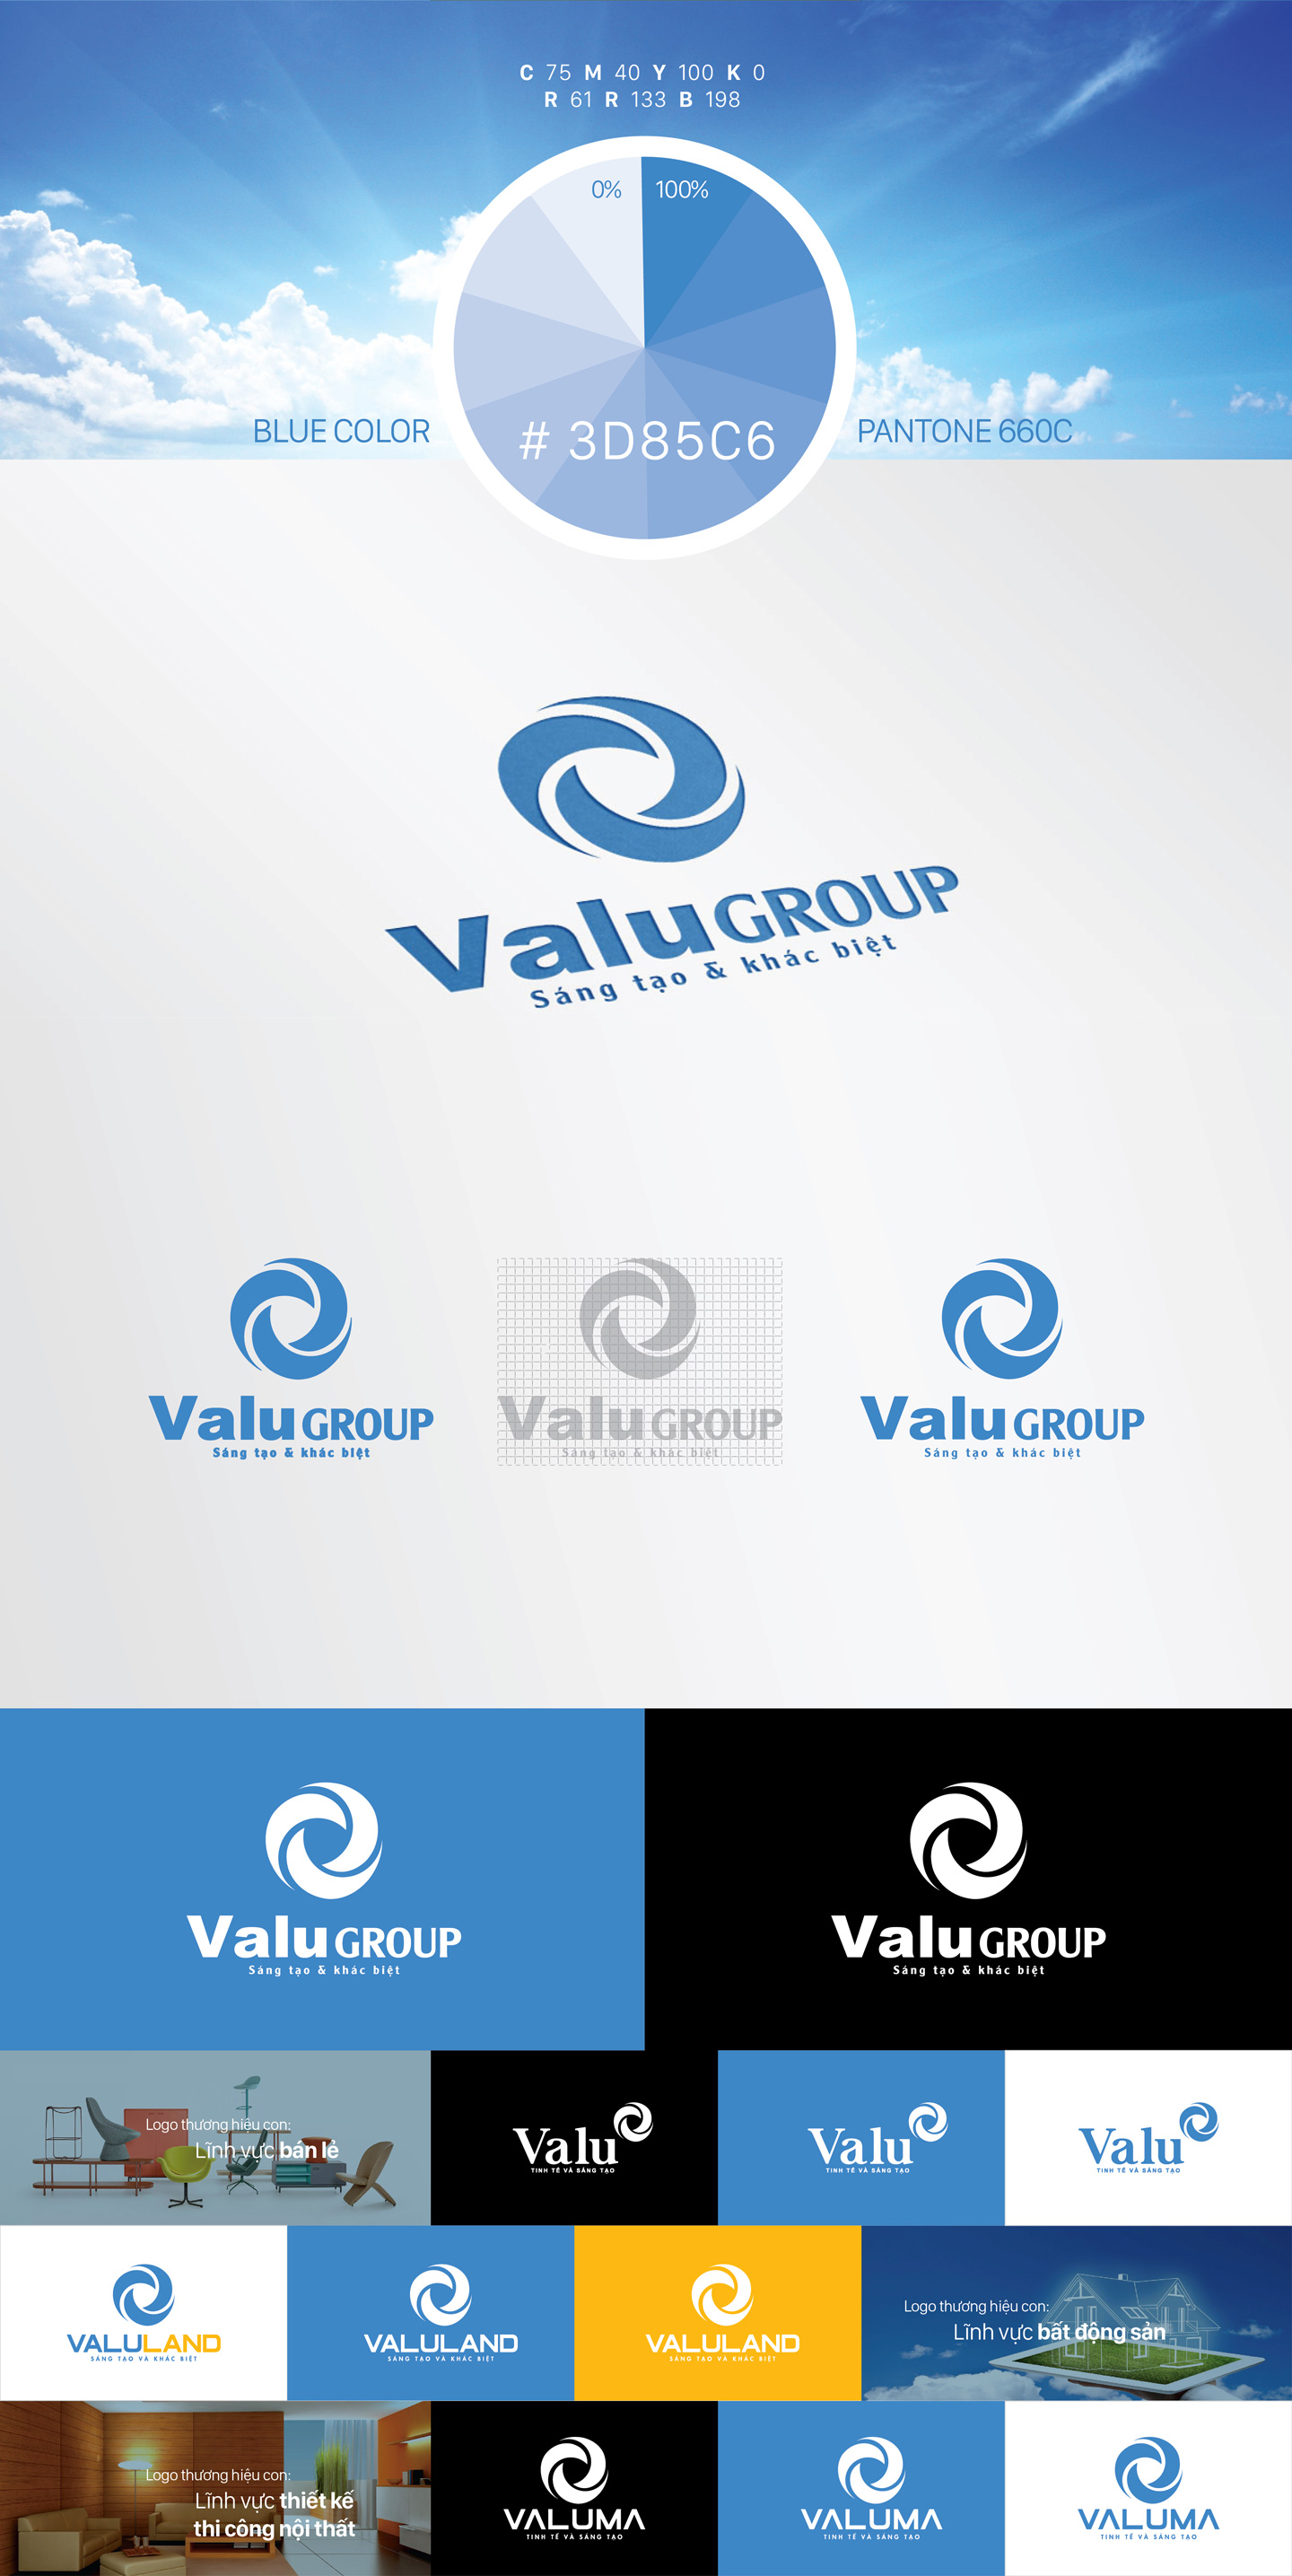 Valu-showcase1-06